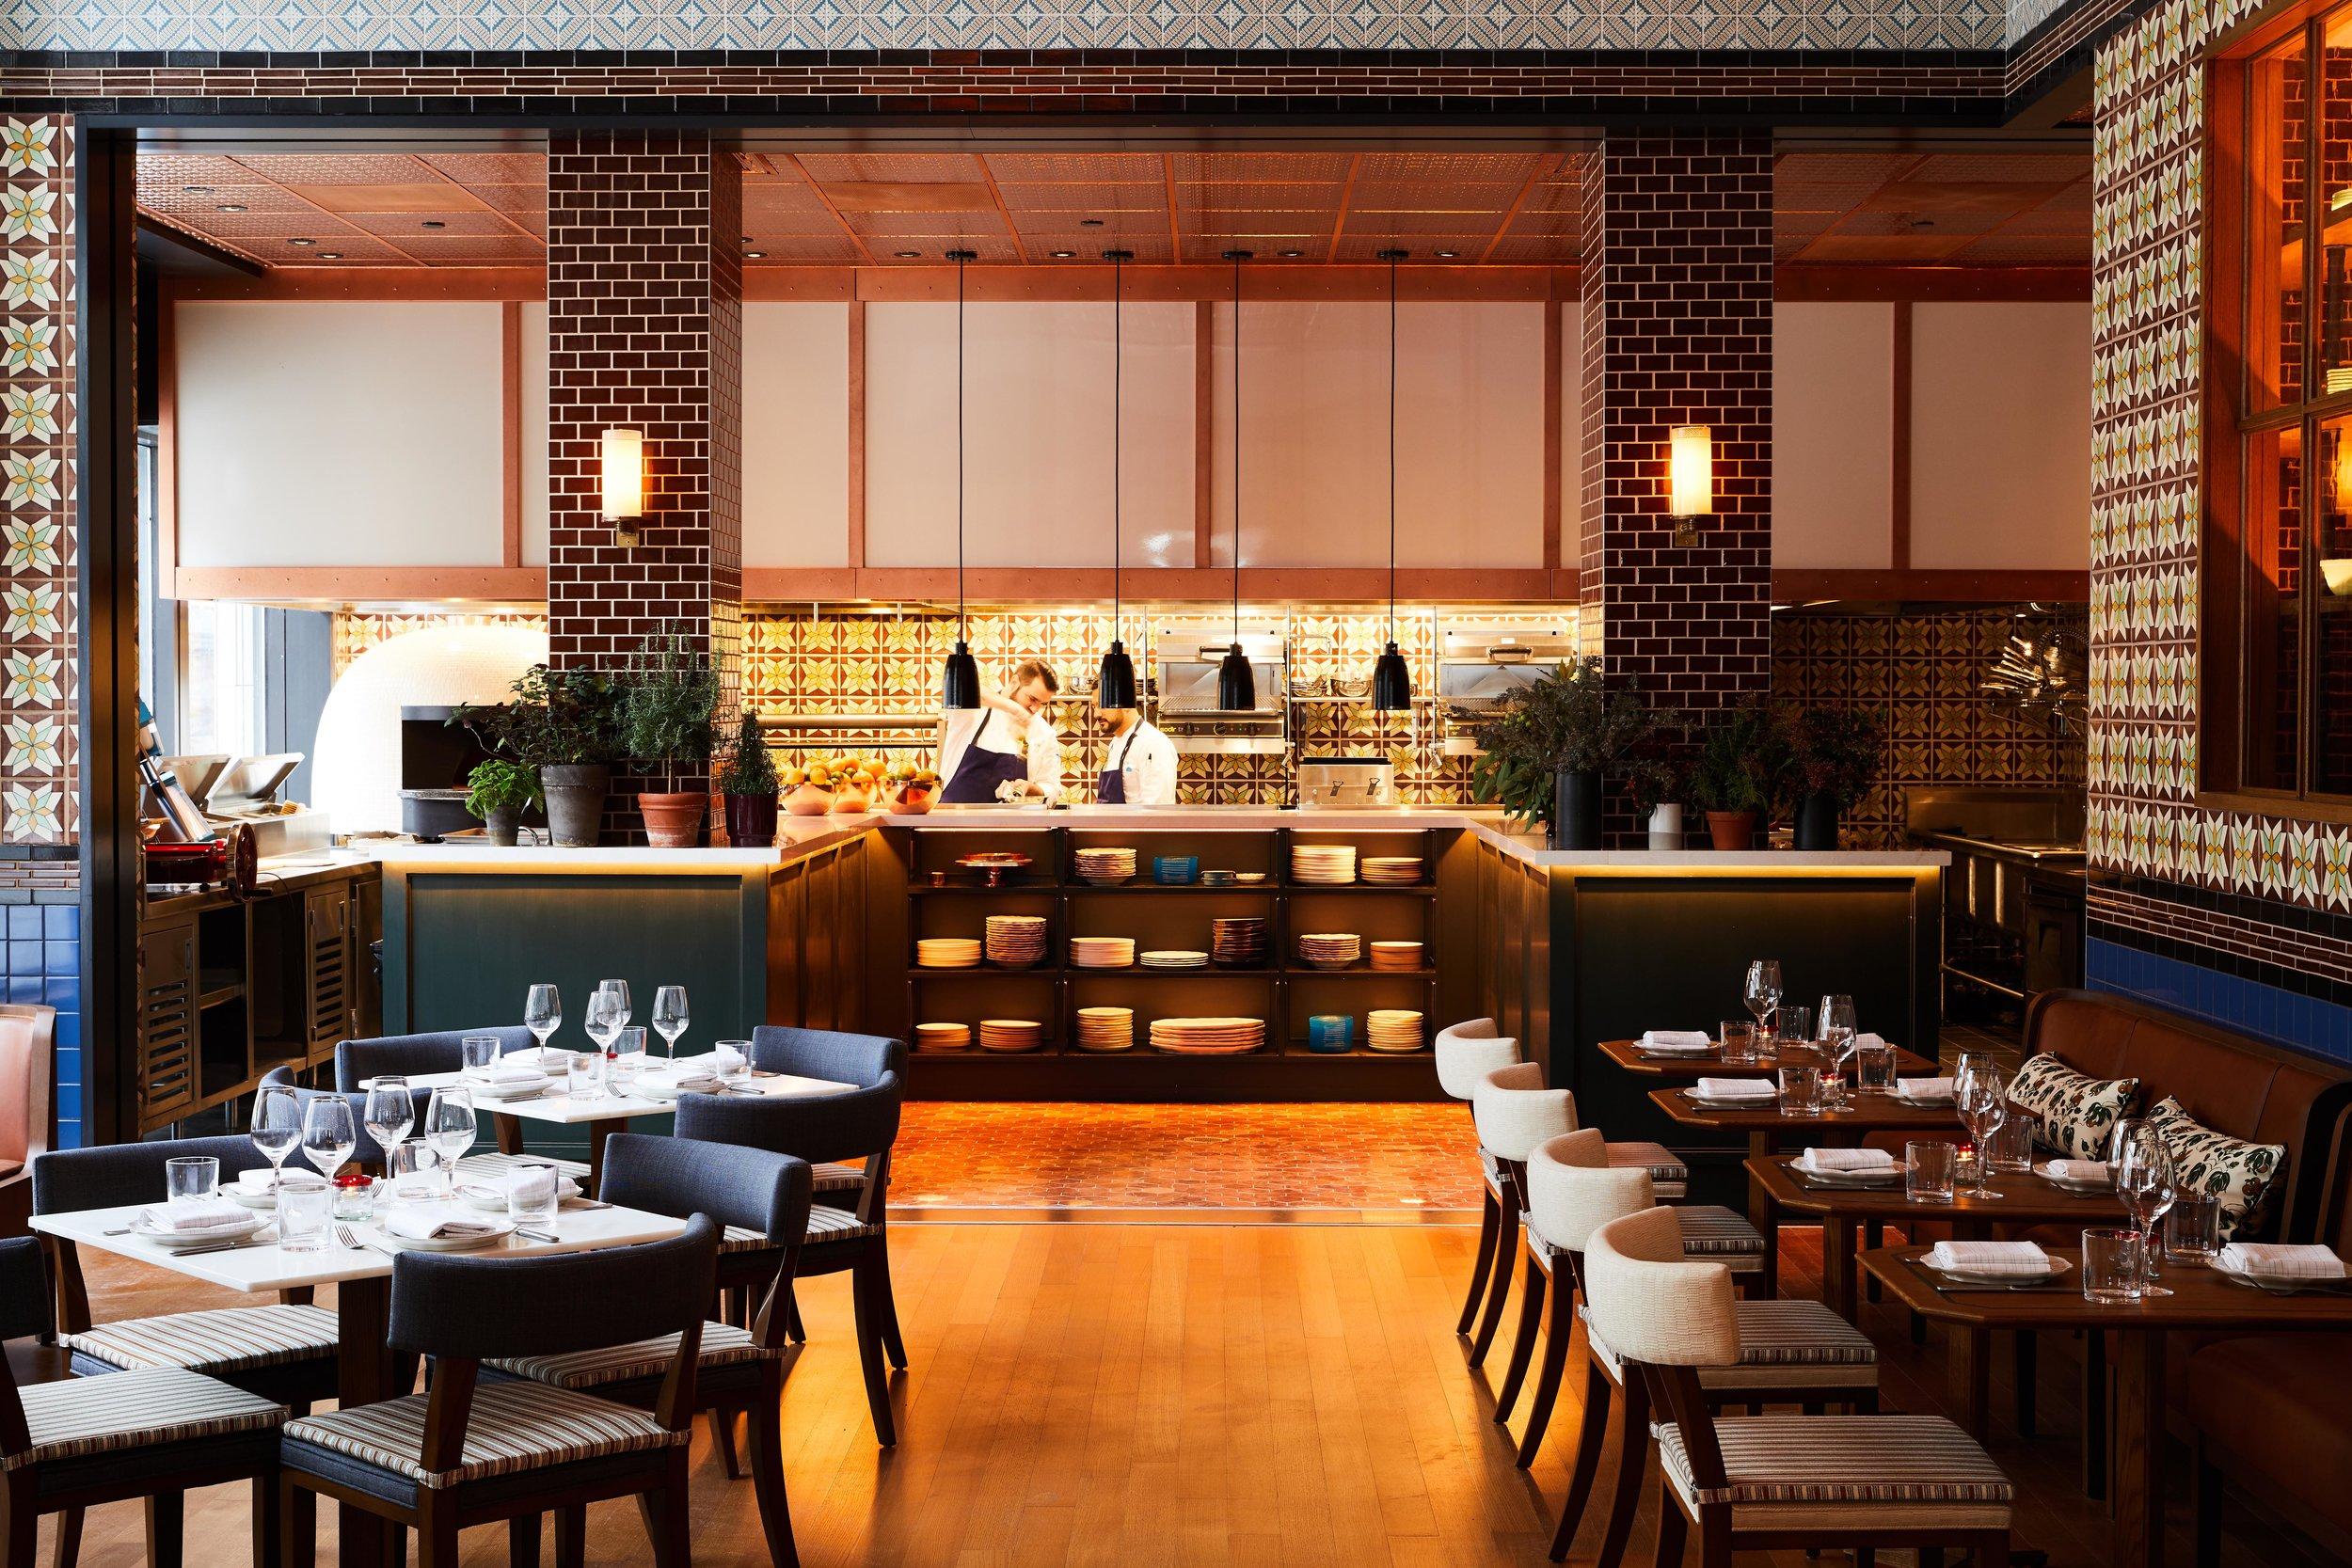 Shinola_San Morello_Restaurant_028 copy.jpg